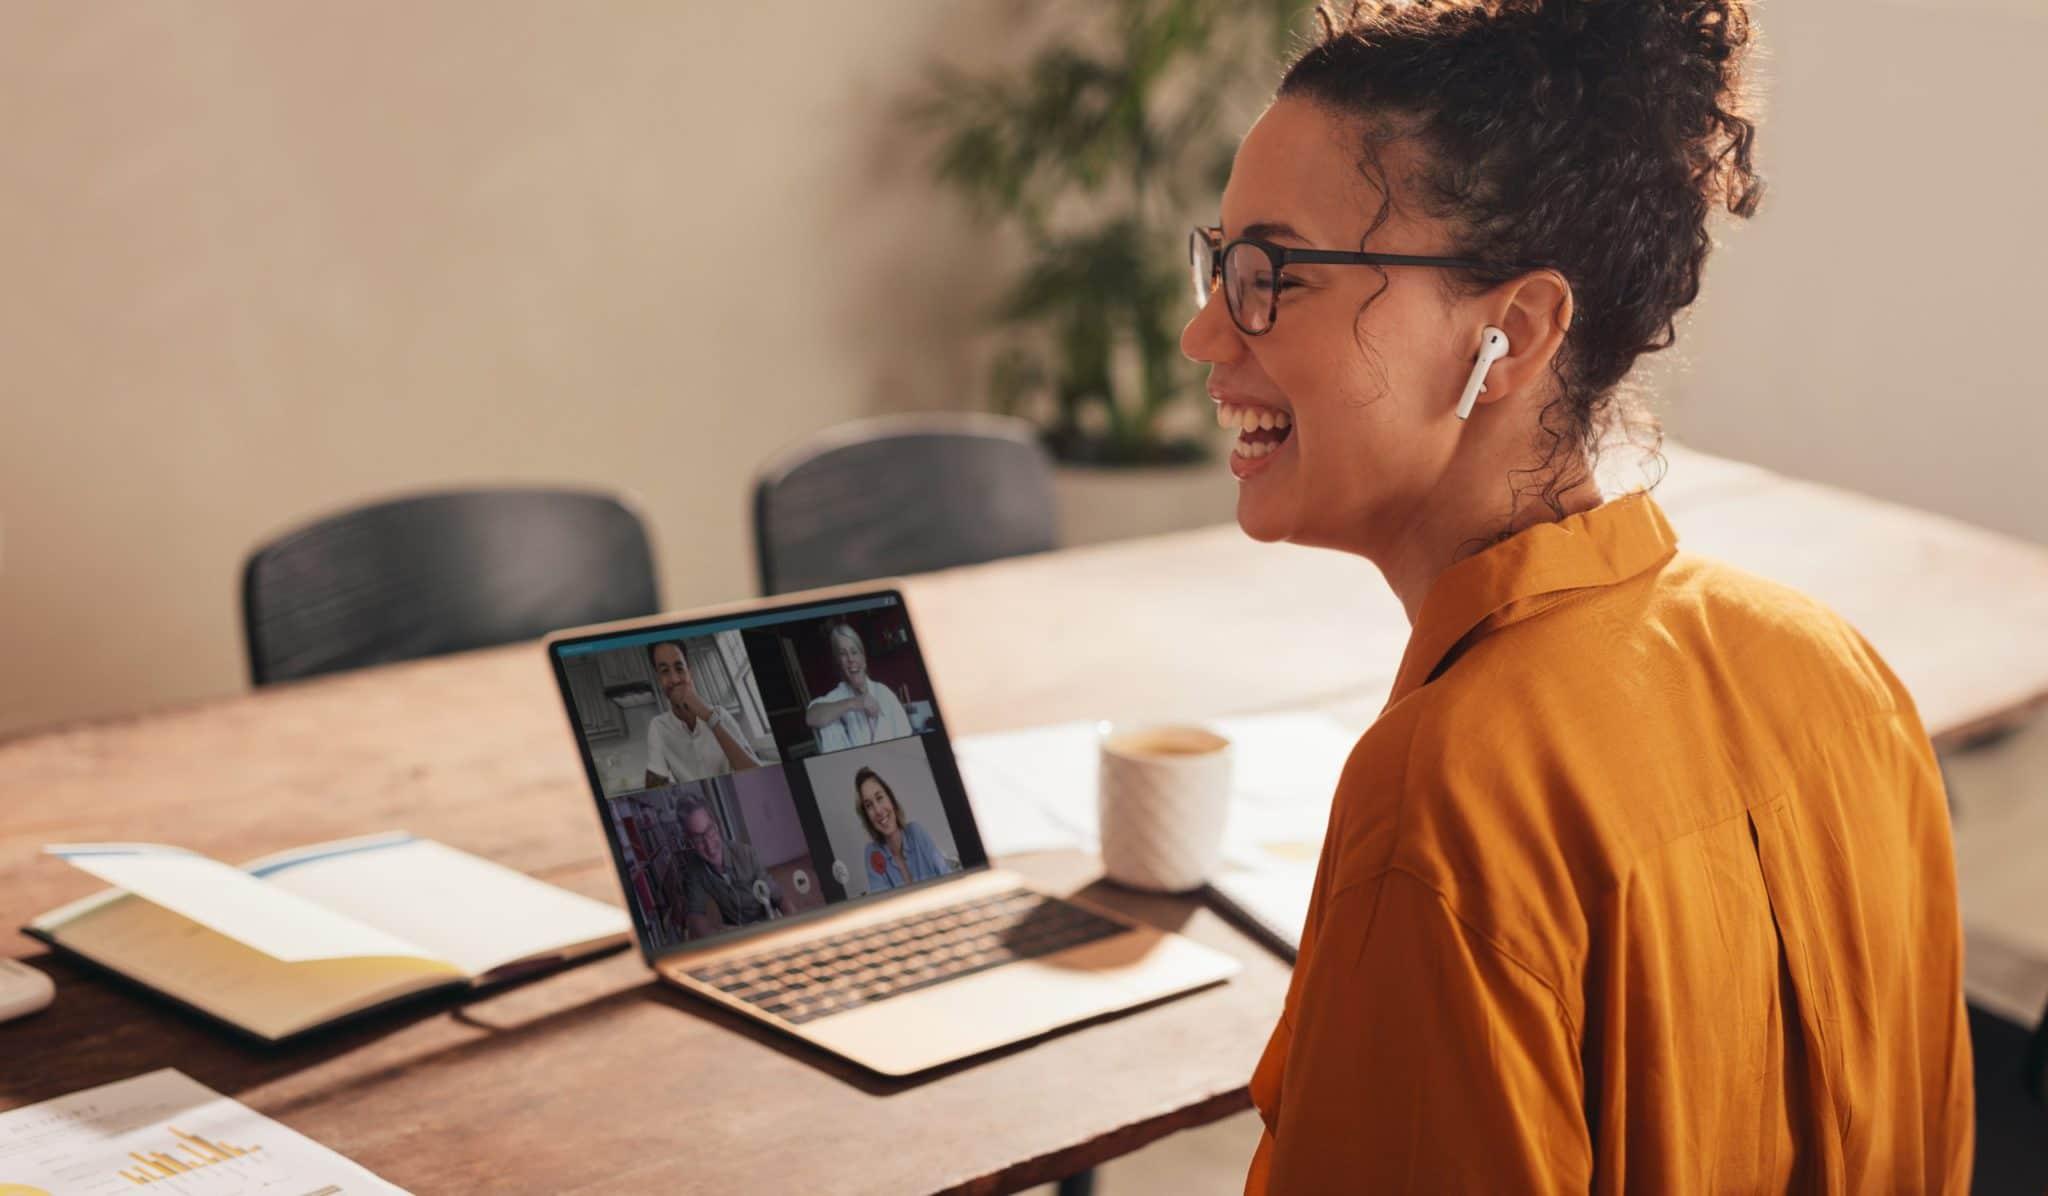 women laughing trying virtual team meeting ideas